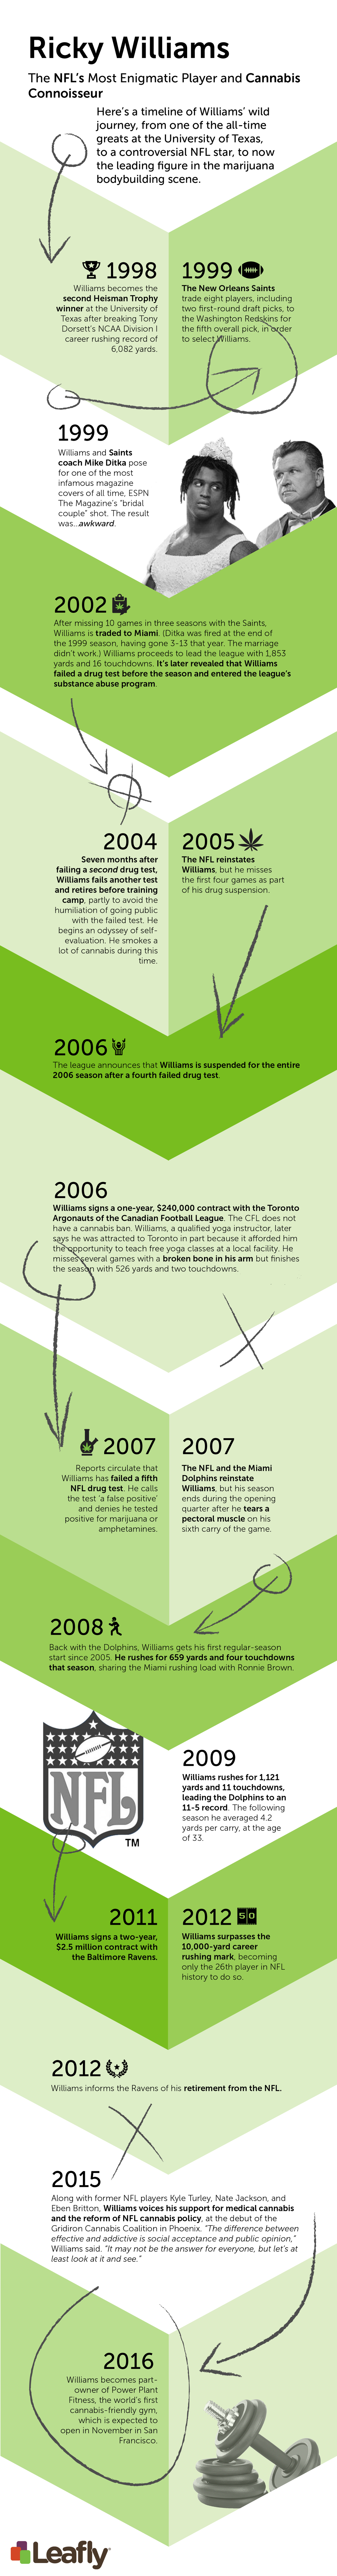 Ricky Williams Marijuana and NFL Timeline Infographic